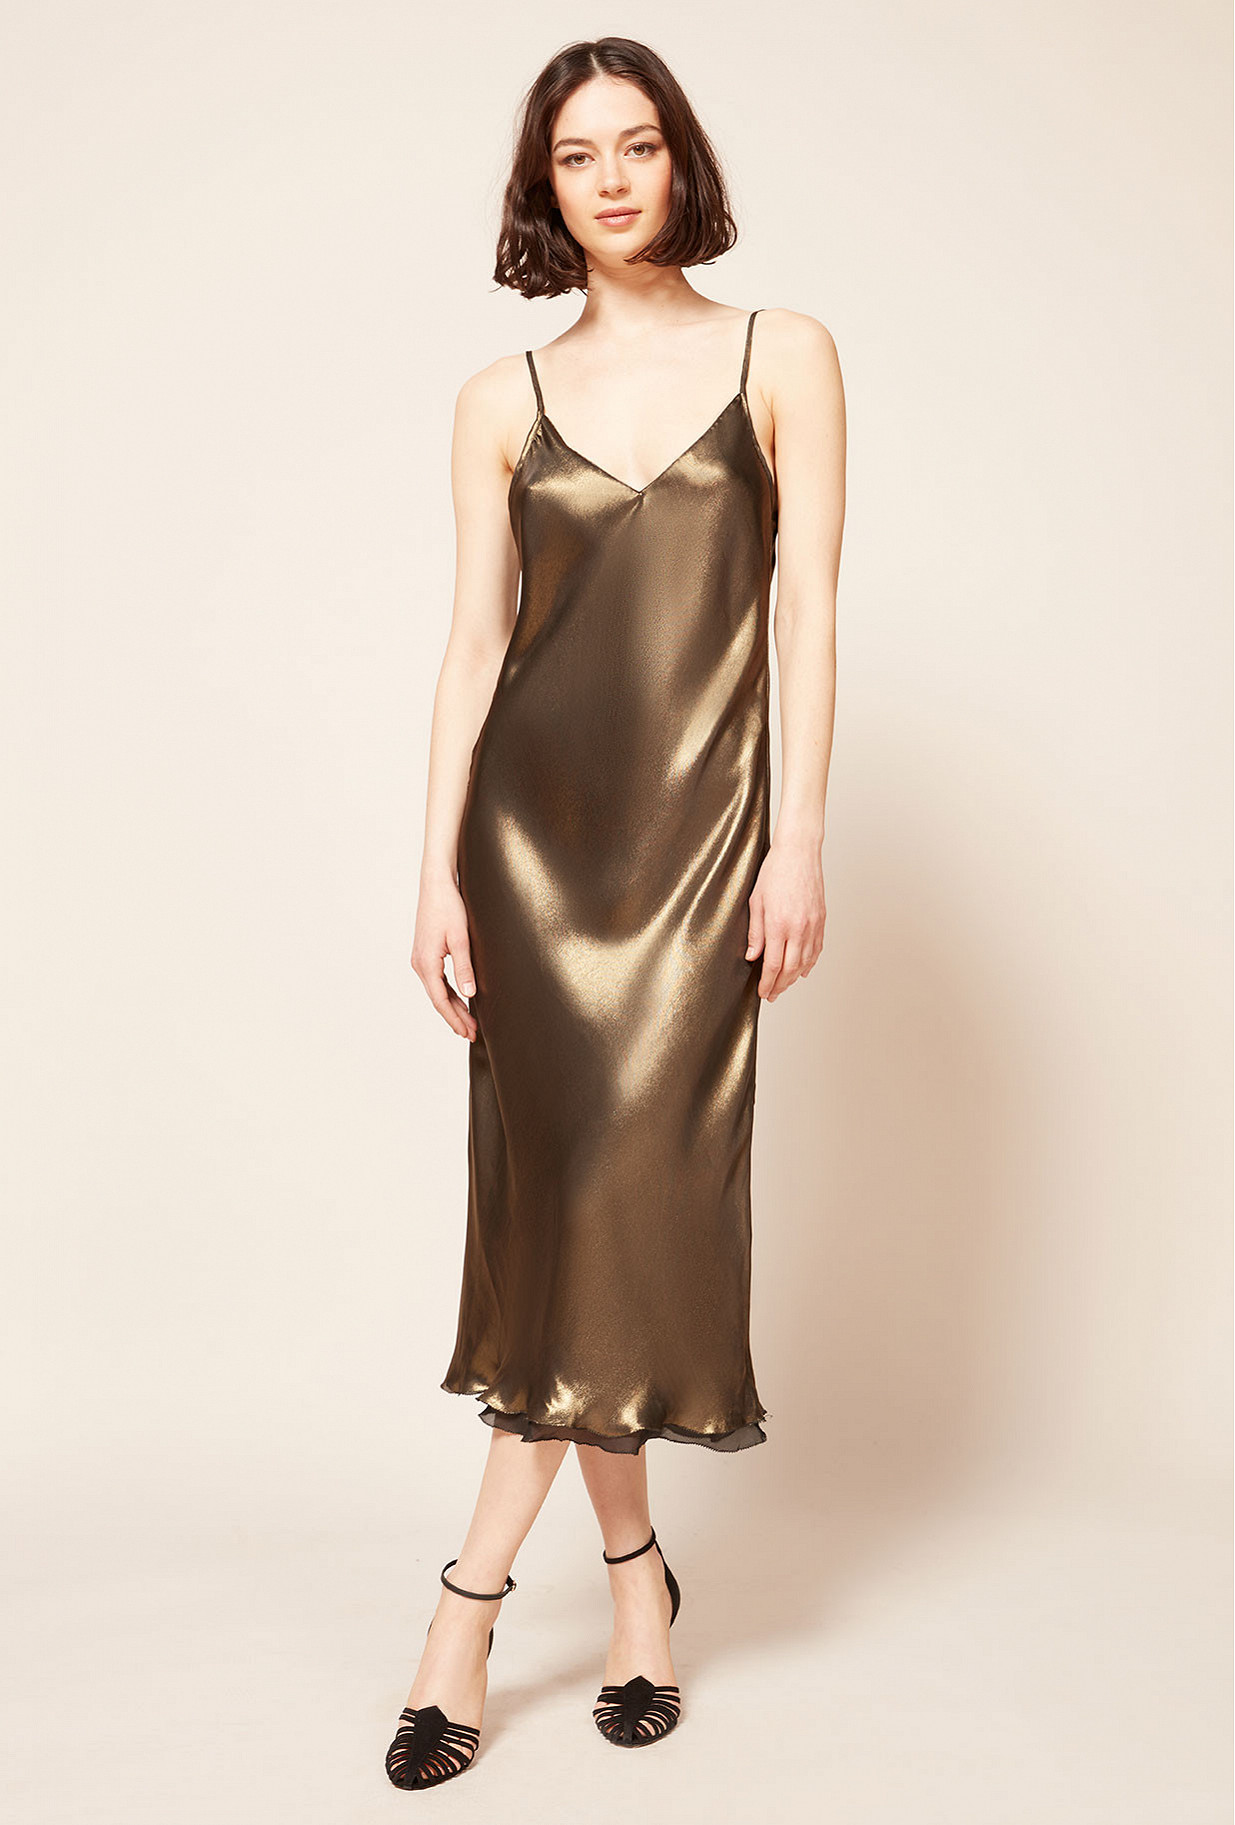 Paris clothes store Dress  Gotha french designer fashion Paris